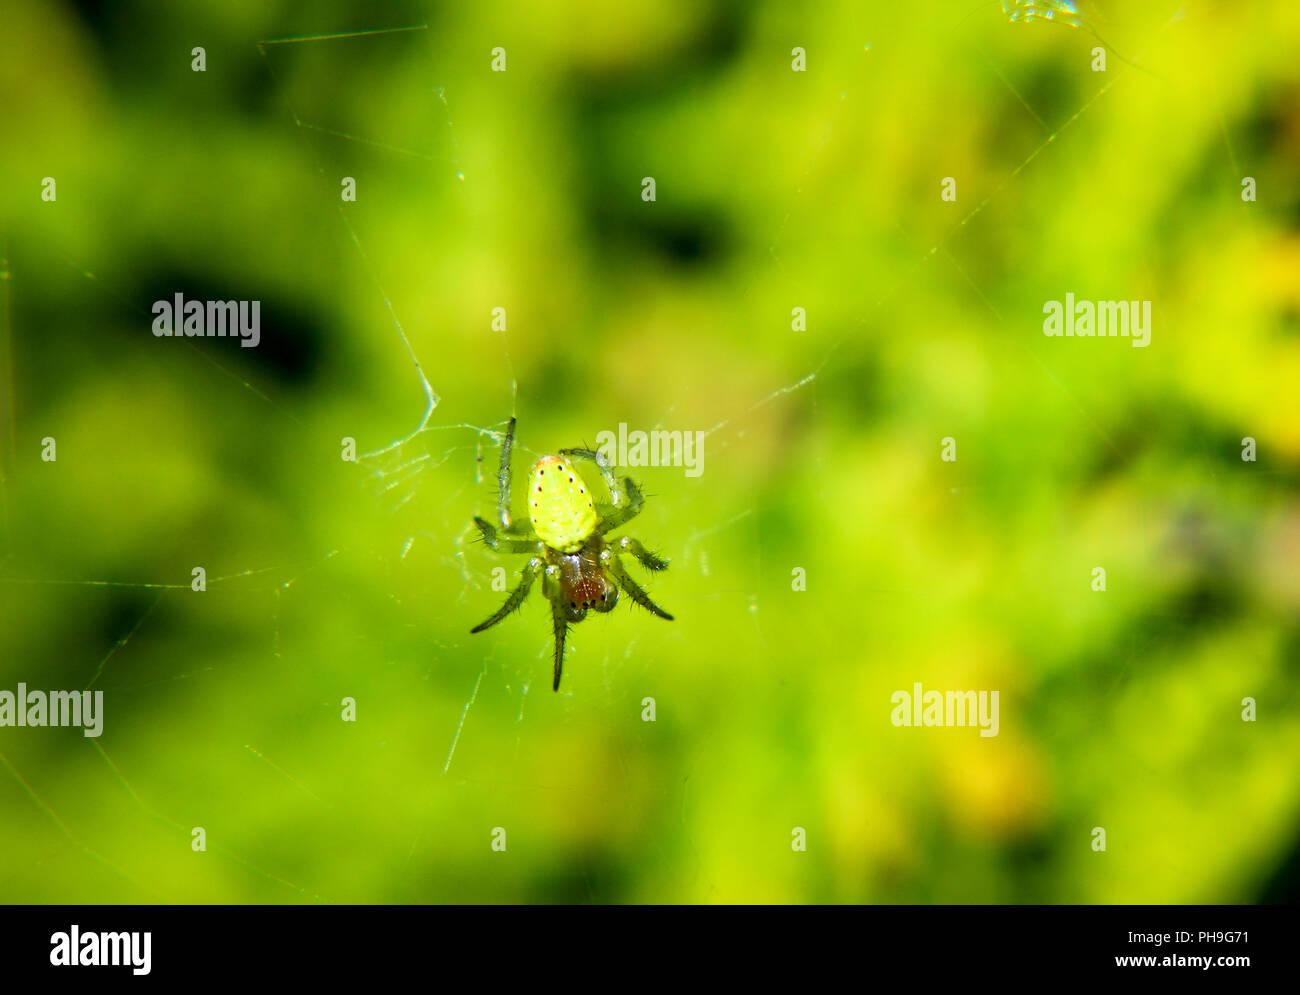 Araniella cf. cucurbitina: Pumpkin spider - Stock Image